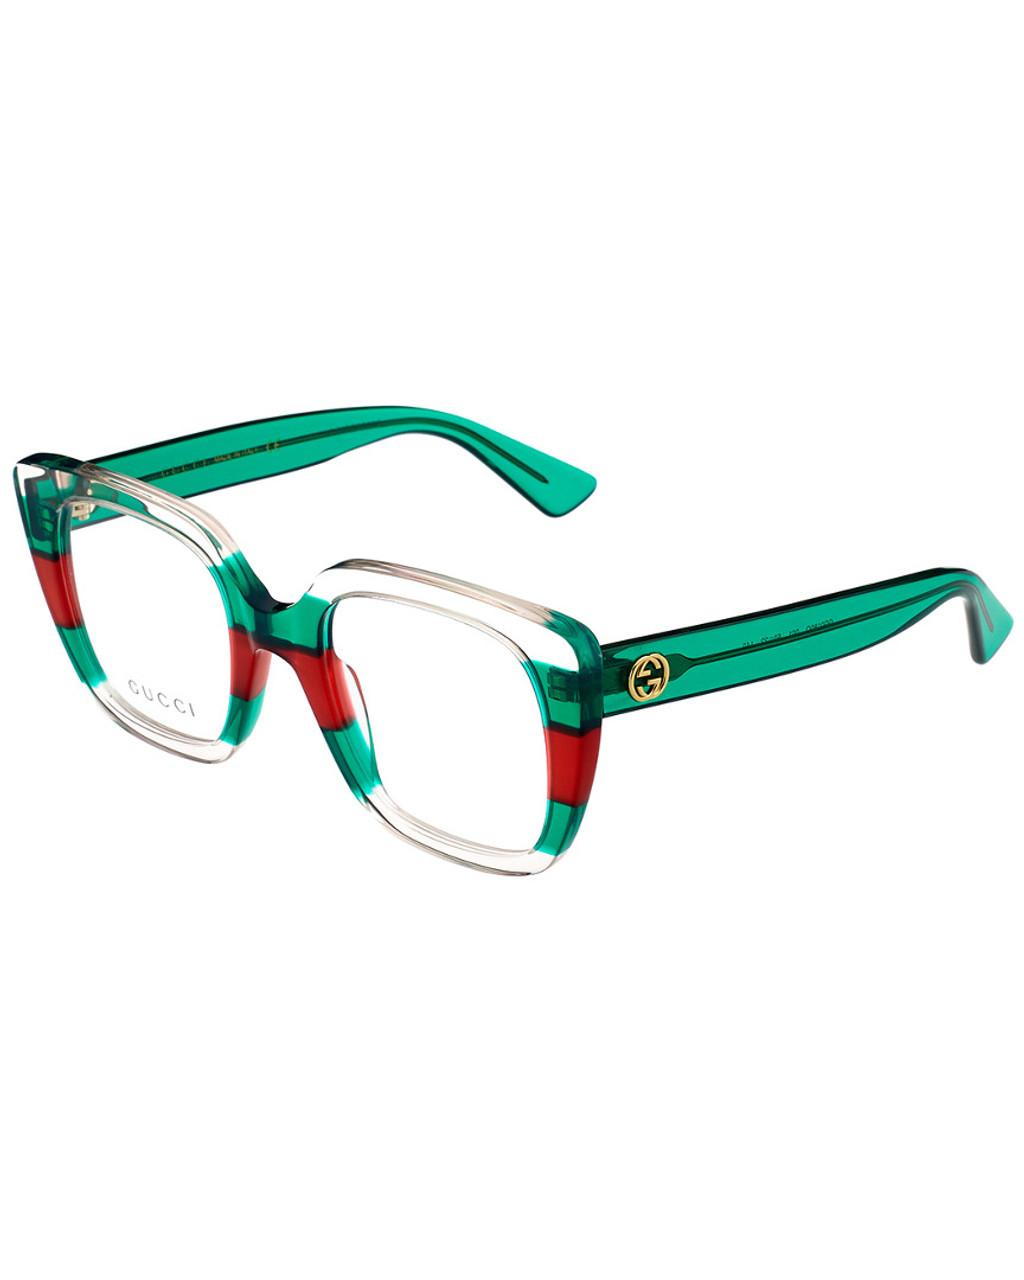 642a64ac662 Gucci Women s GG0180O-30001805001 50mm Optical Frames~1111052849 ...